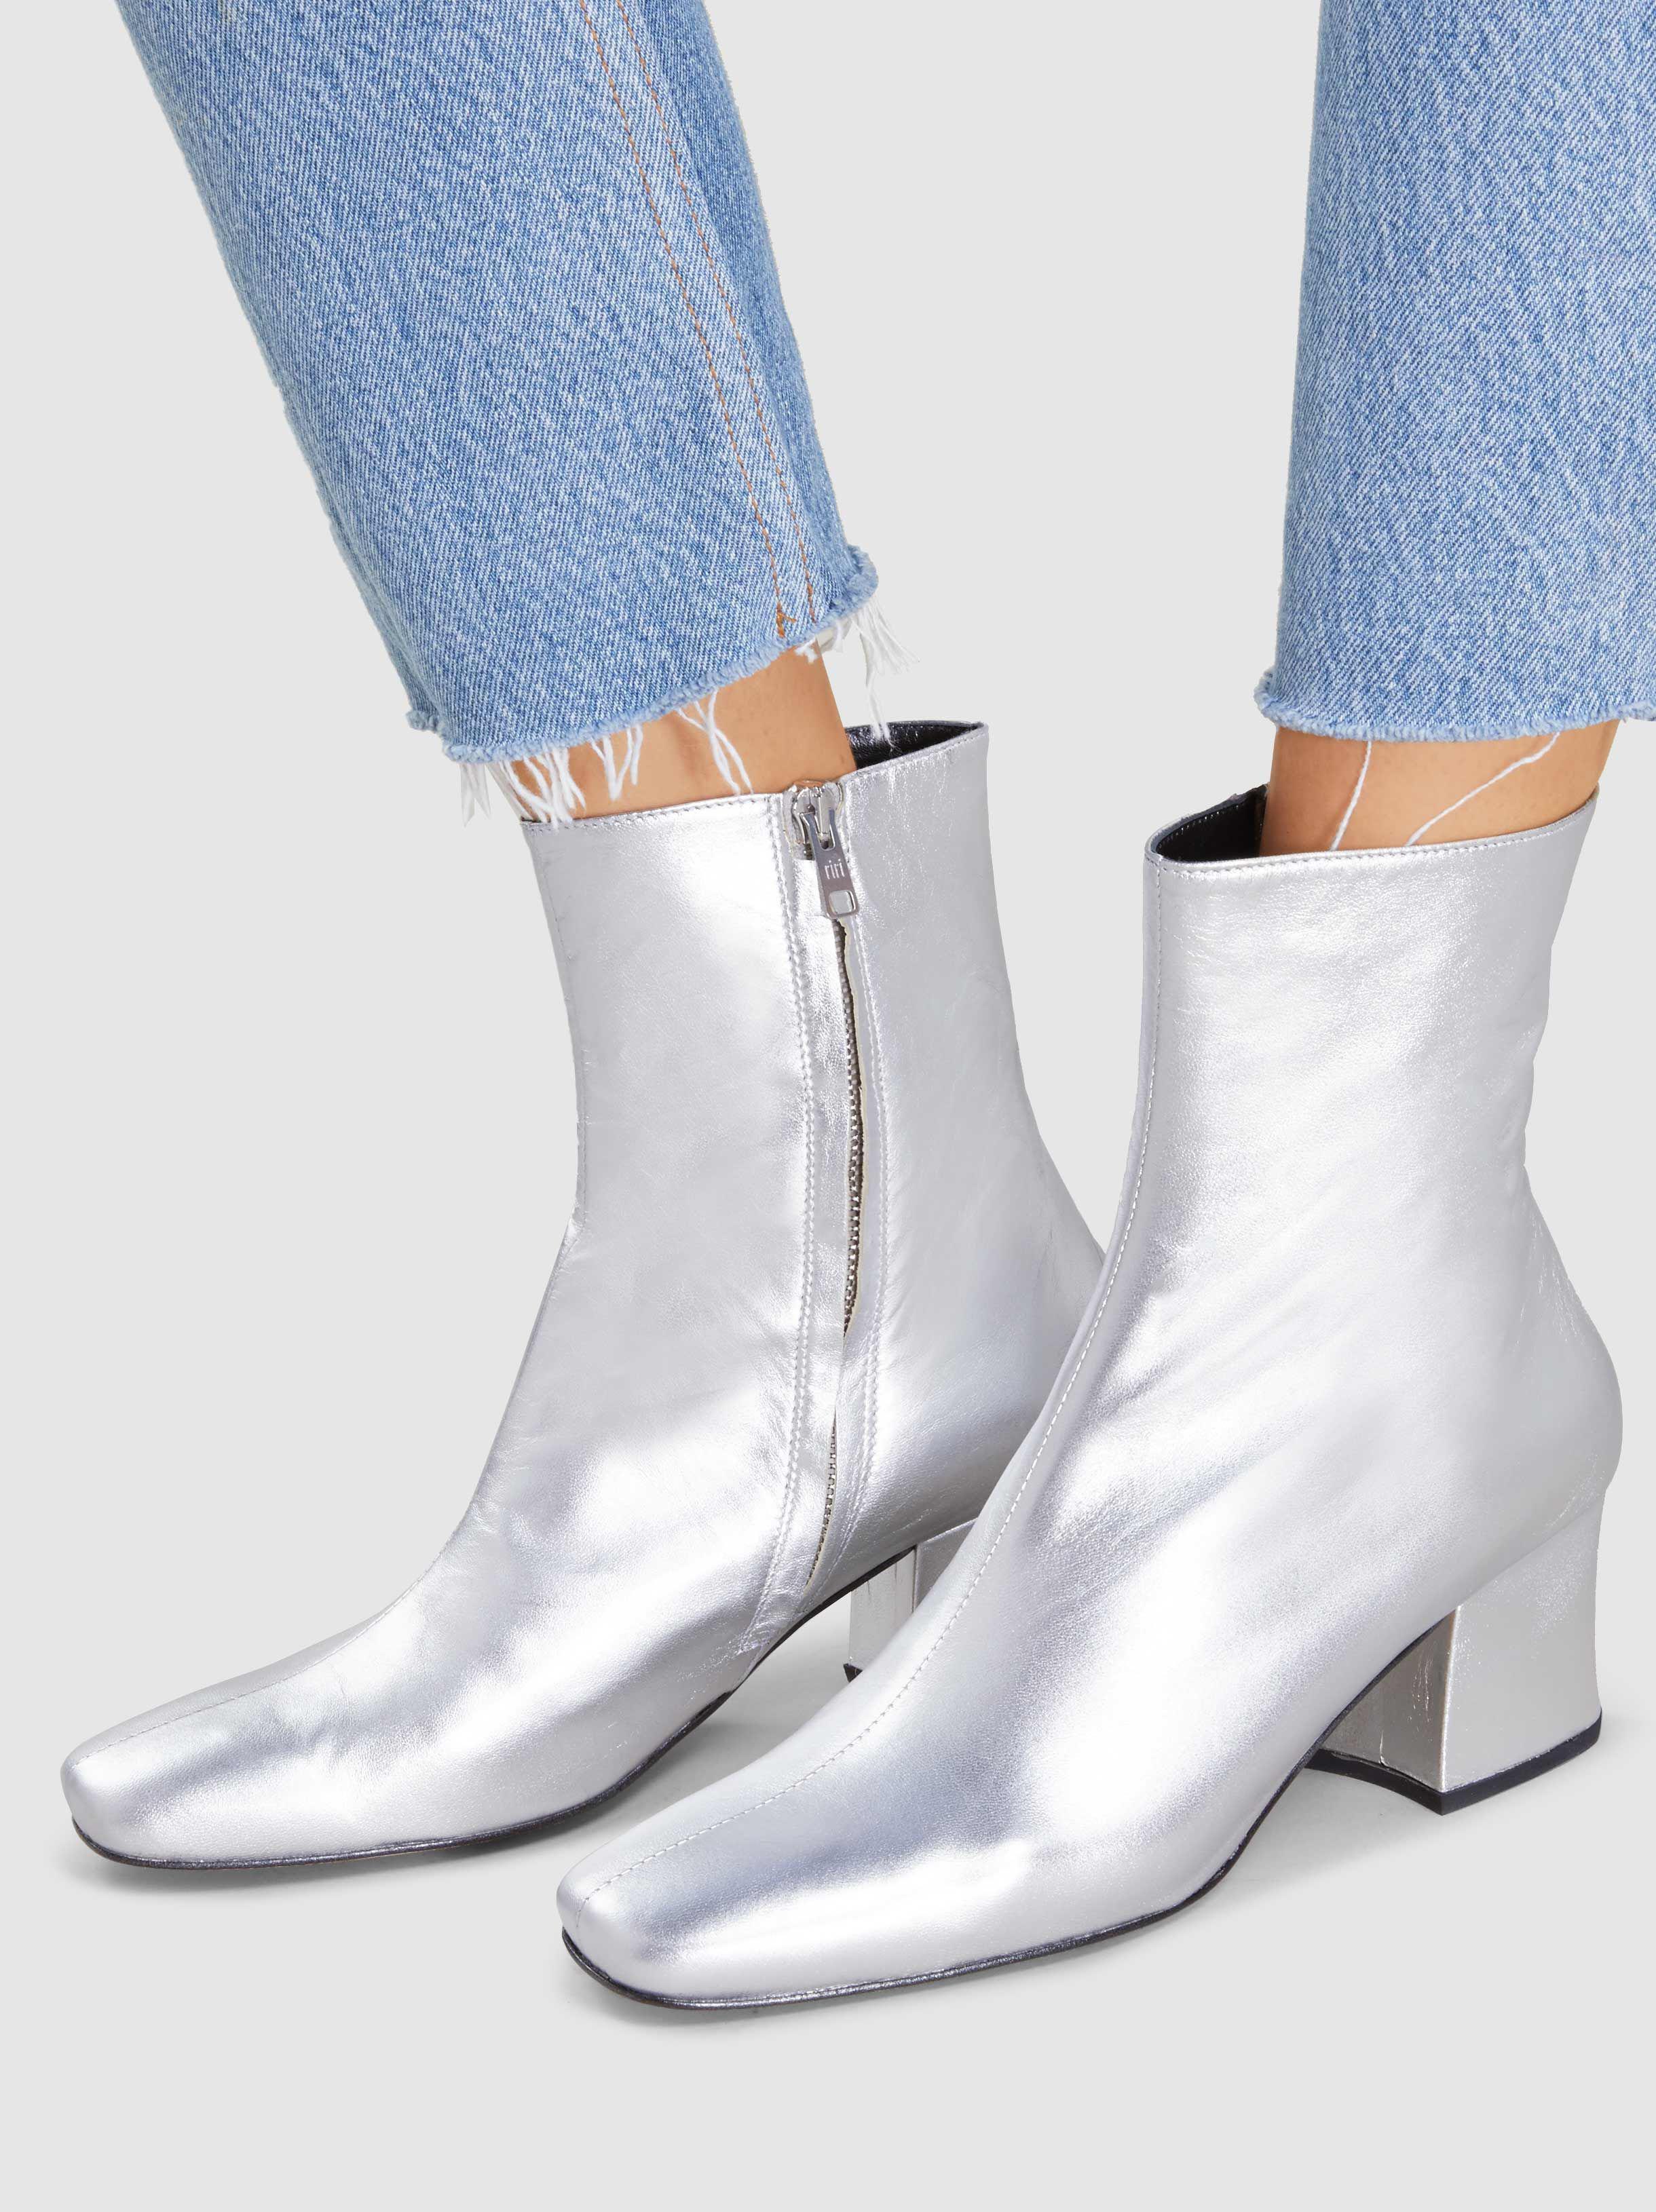 store cheap price amazing price for sale Dorateymur Sybil Leek ankle boots 100% original d1PSmR